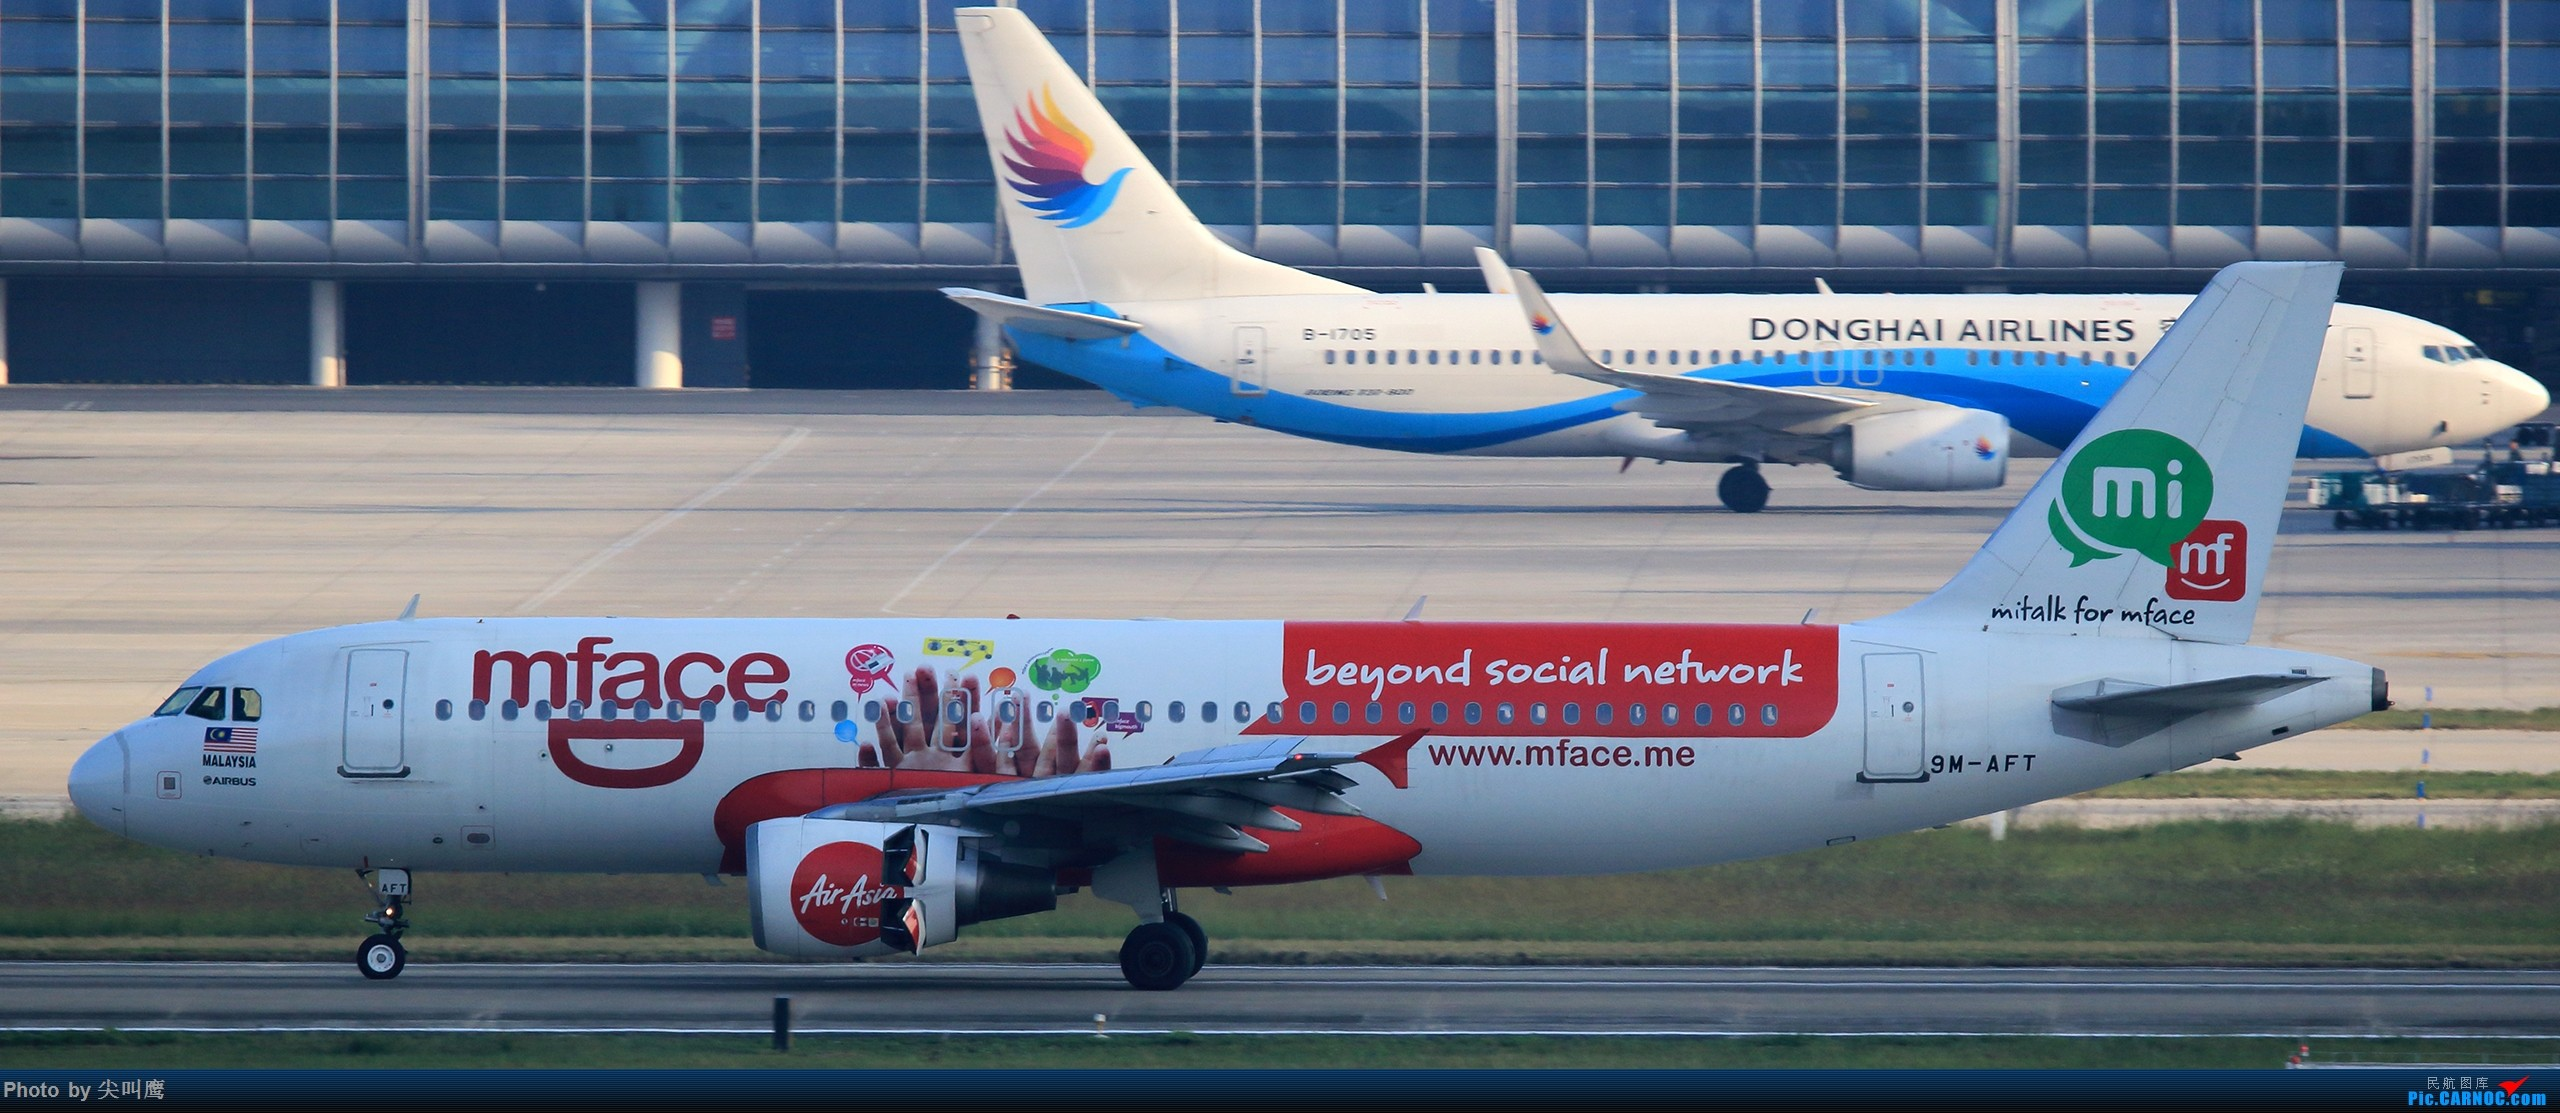 Re:[原创]NNG的马来西亚亚航小合集 AIRBUS A320-200 9M-AFT 中国南宁吴圩国际机场